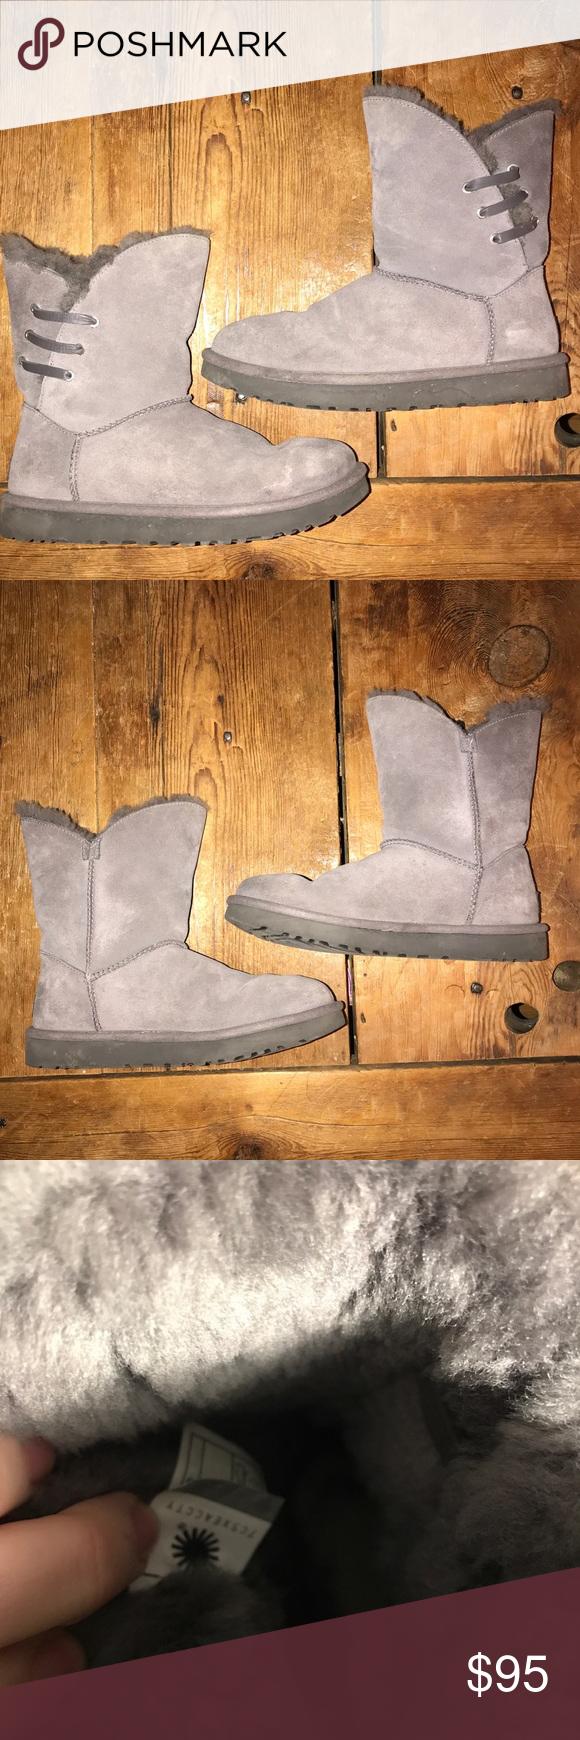 Women's Gray UGG Classic Short Boots Sz 9